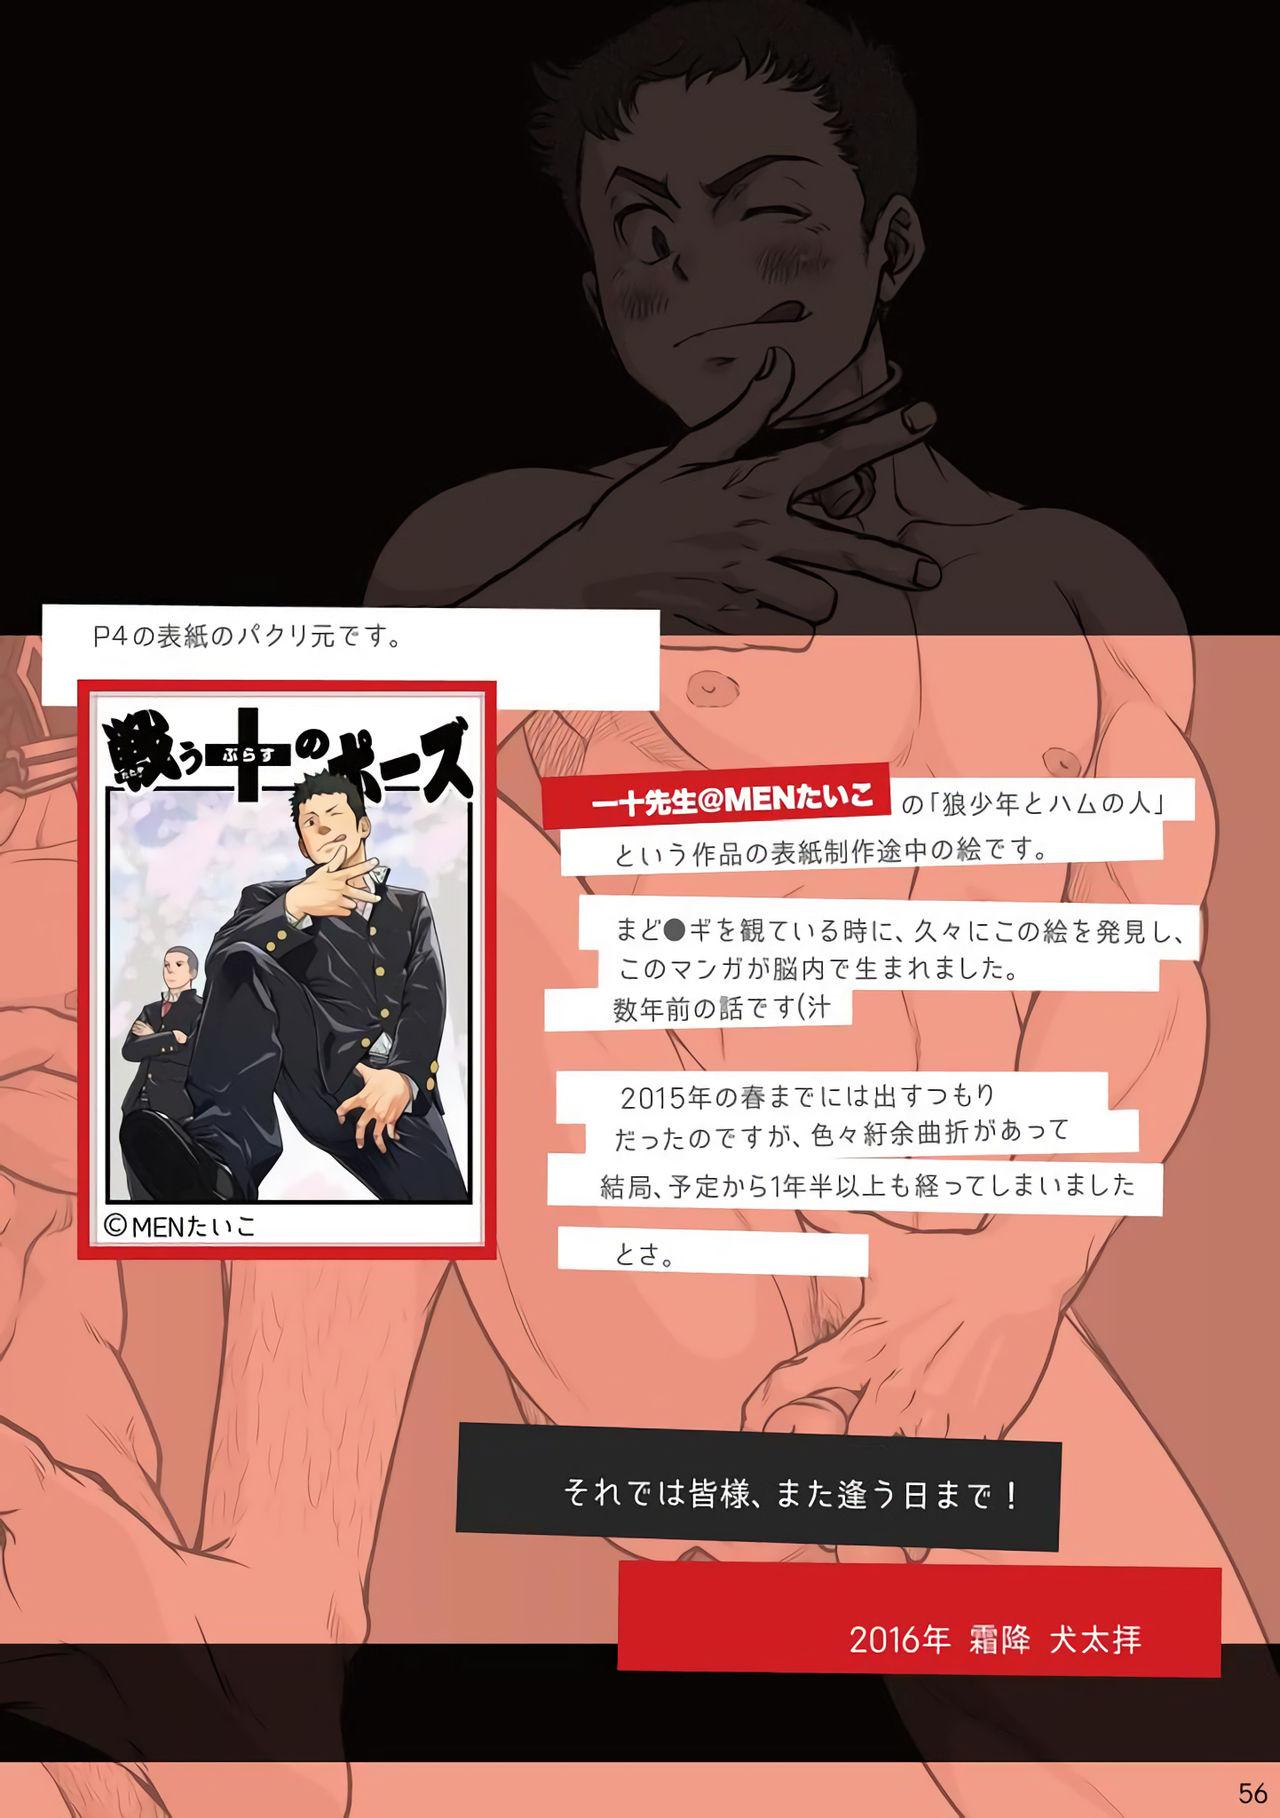 [Pagumiee (Kenta)] Tatakae!+++ (Plus-san)!! [English] [N04h] [Digital] 57